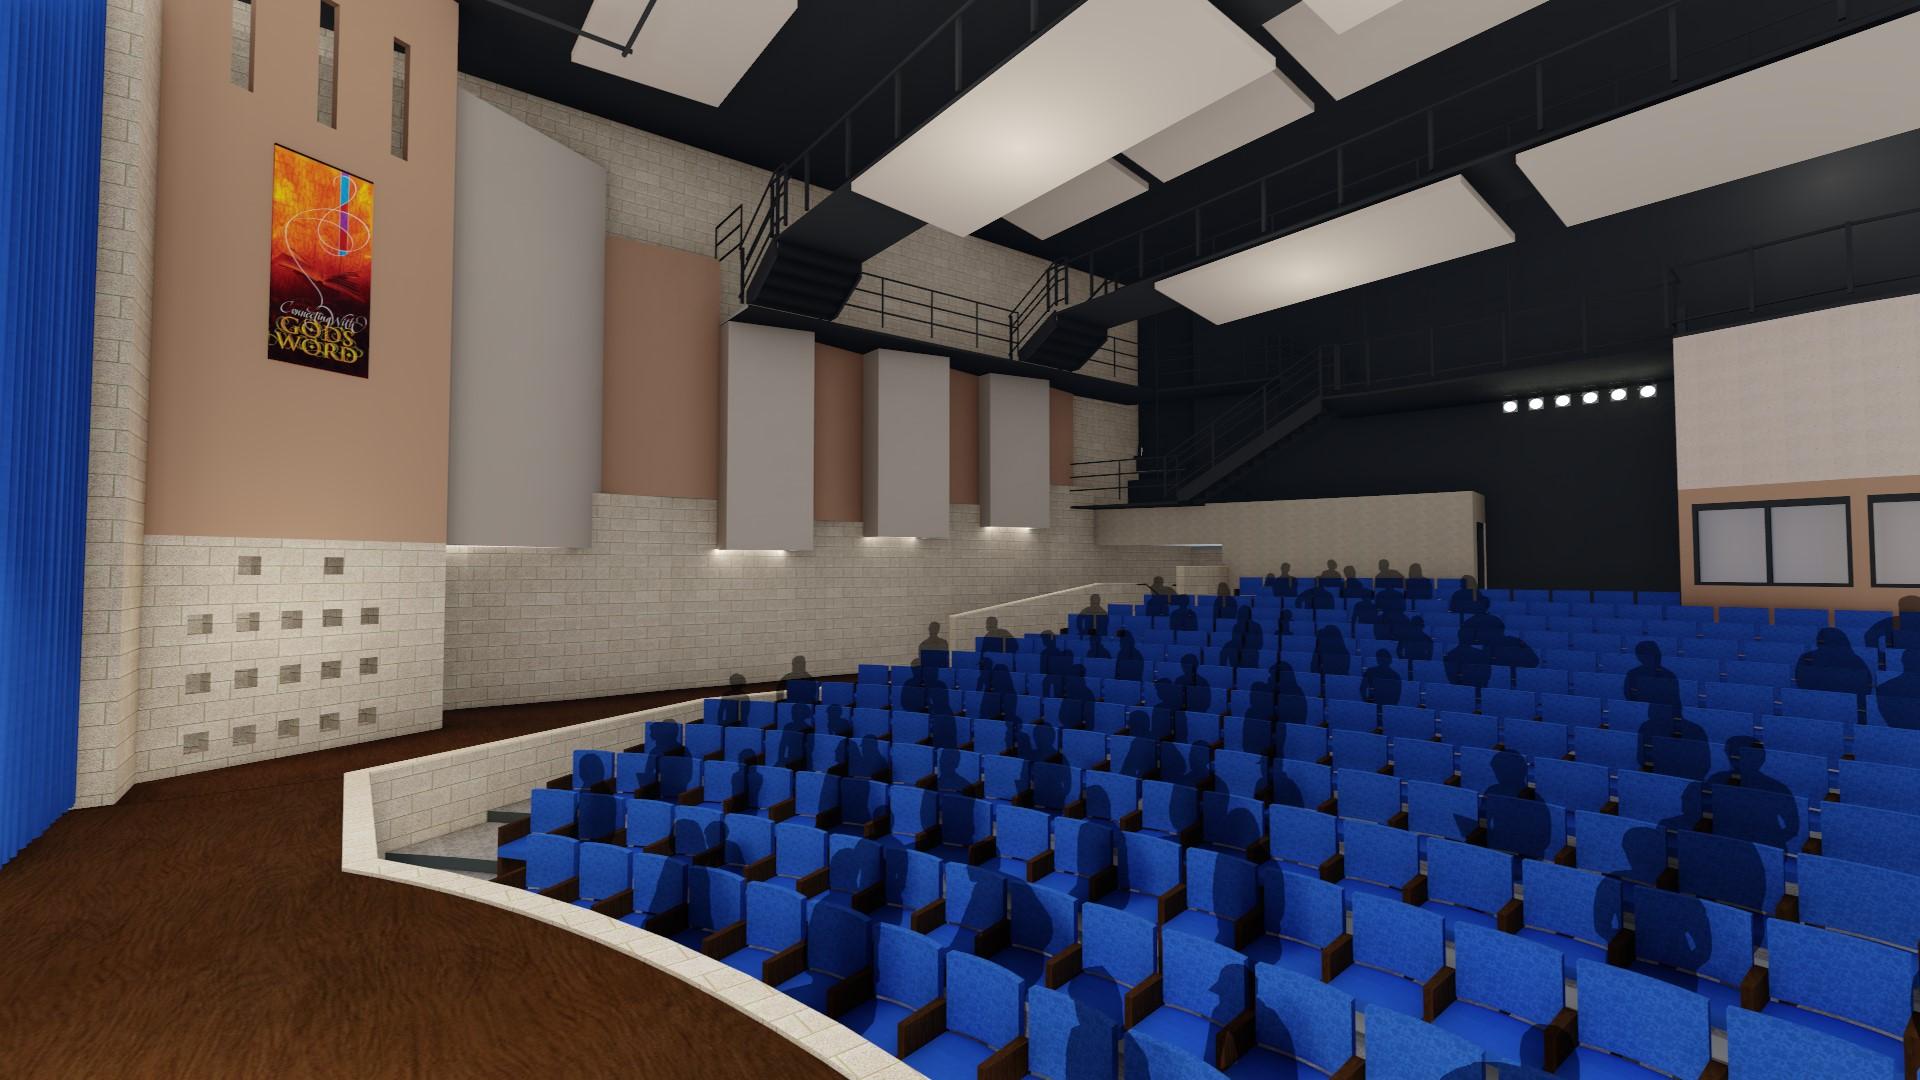 2765 - 2018-04-16 - Side of theatre 2.jpg